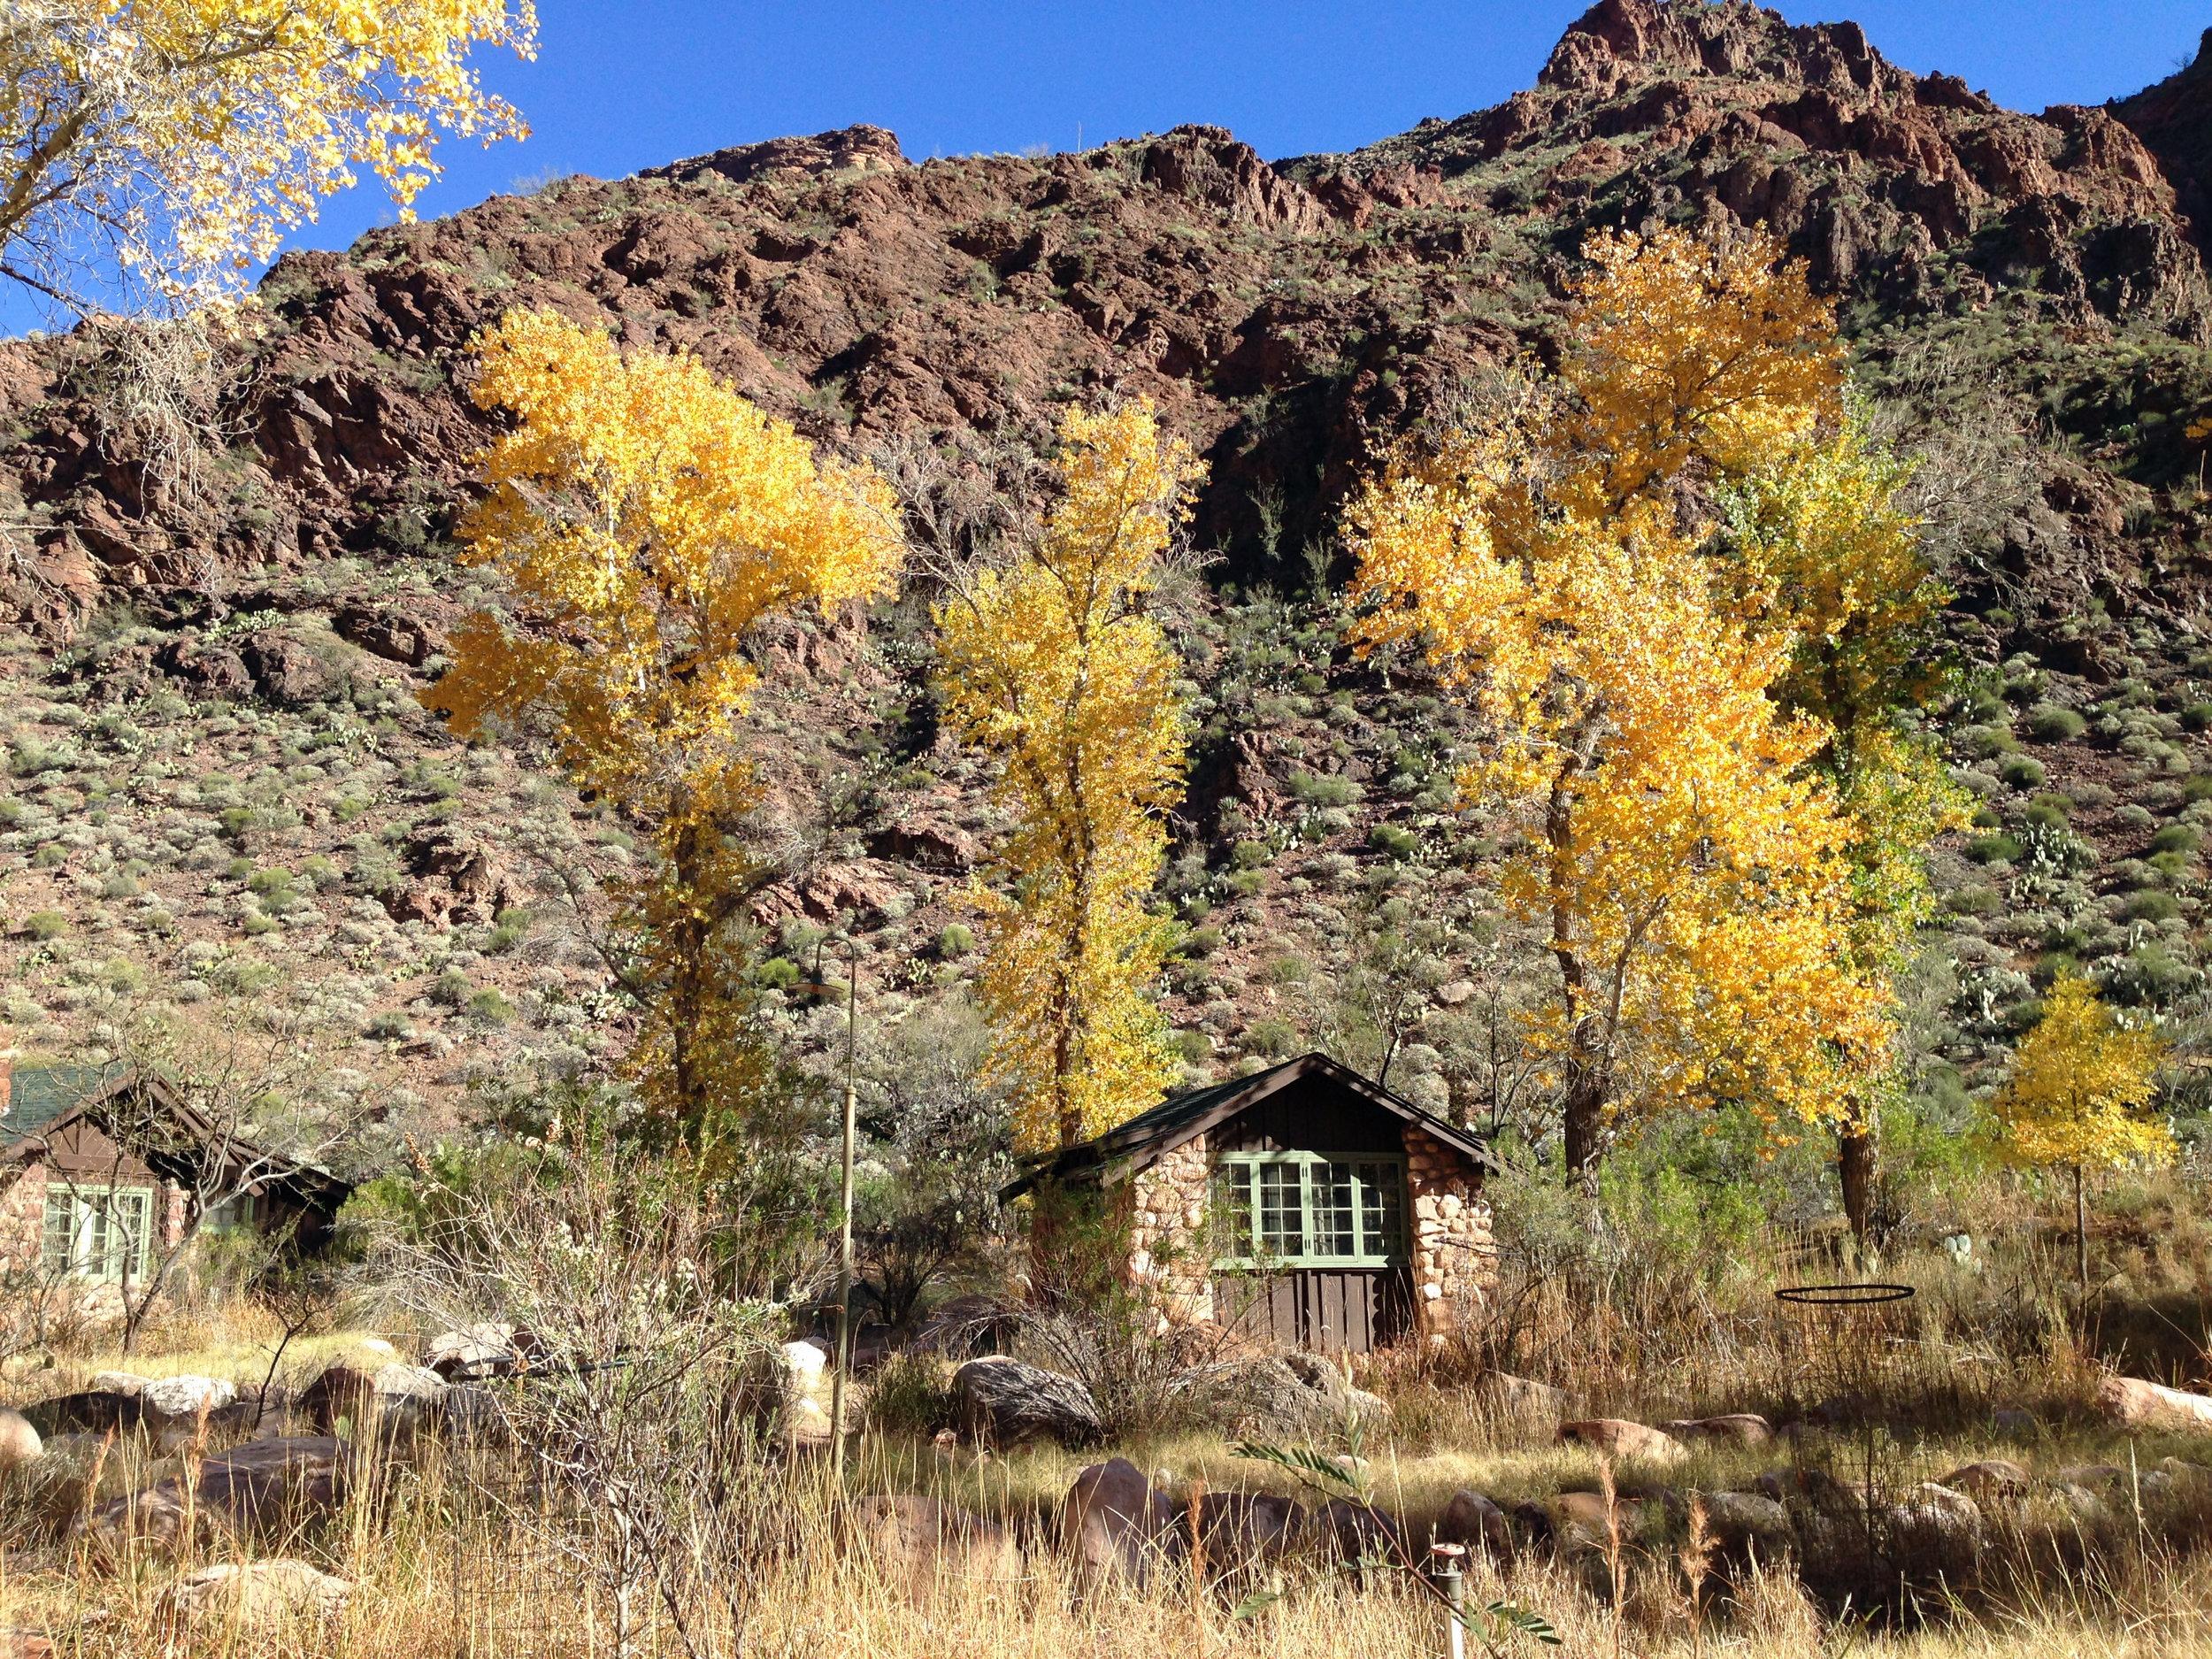 Fall_foliage_at_Phantom_Ranch.JPG